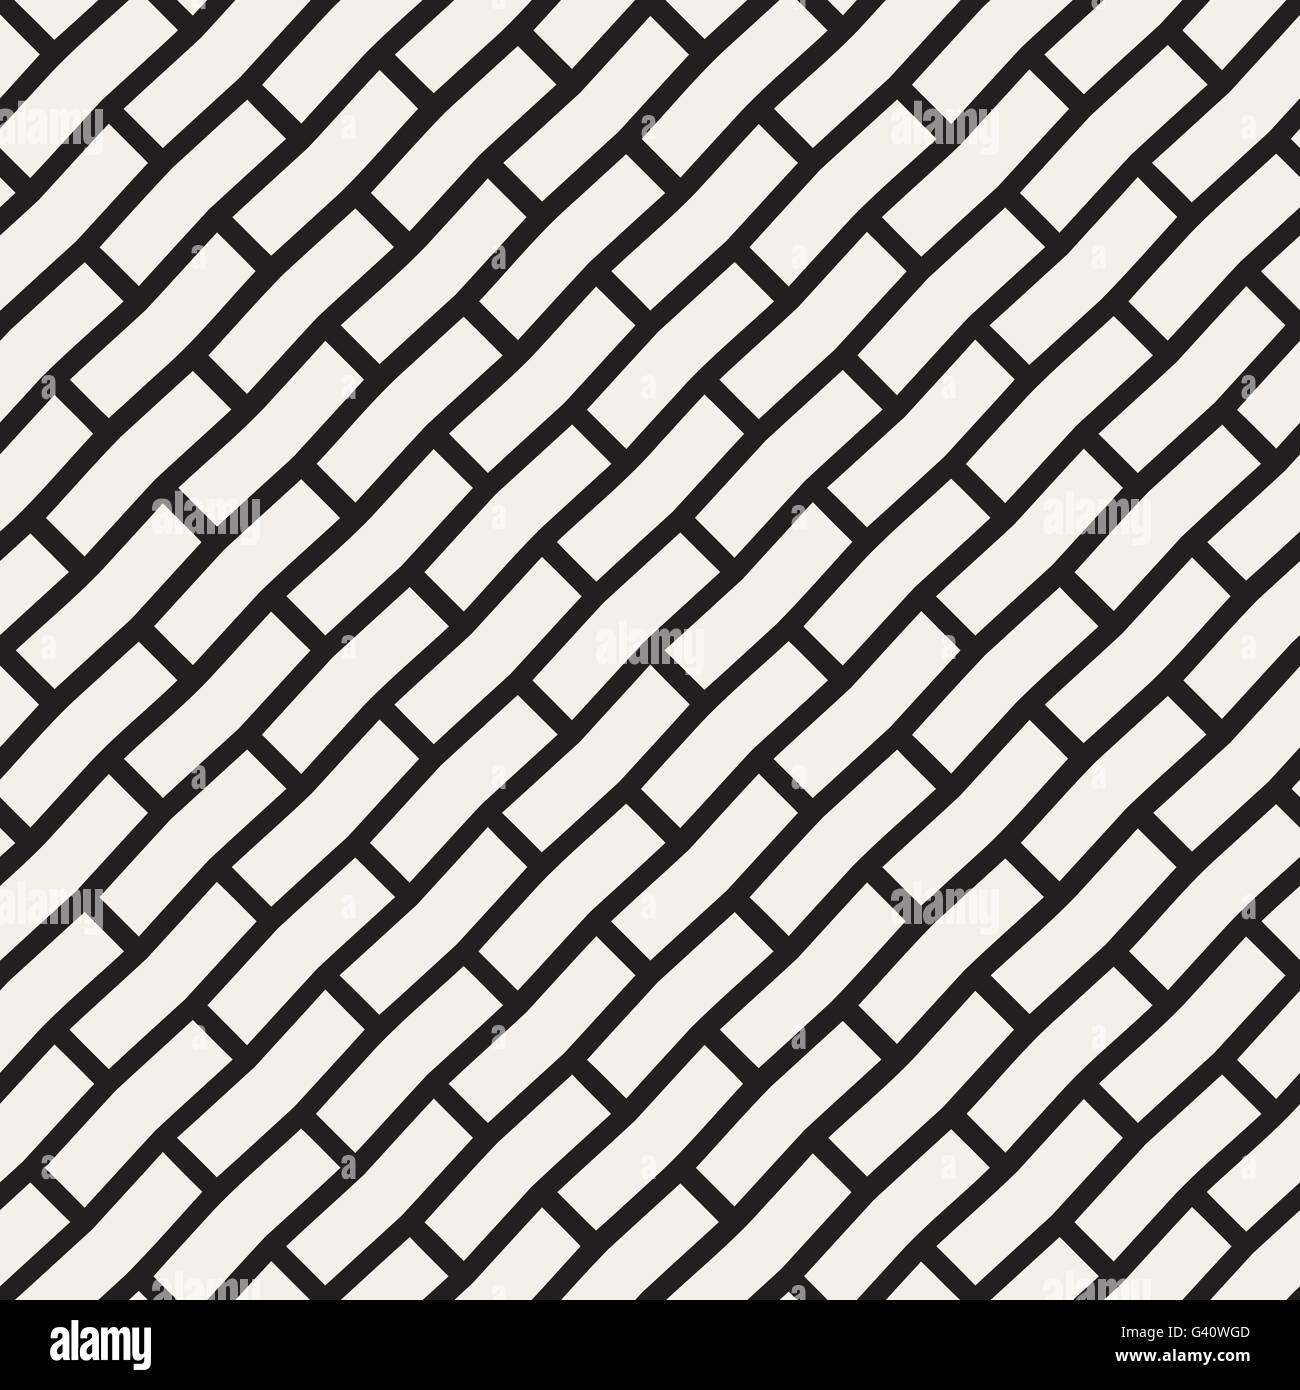 Diagonal Line Design : Vector seamless black and white brick pavement diagonal